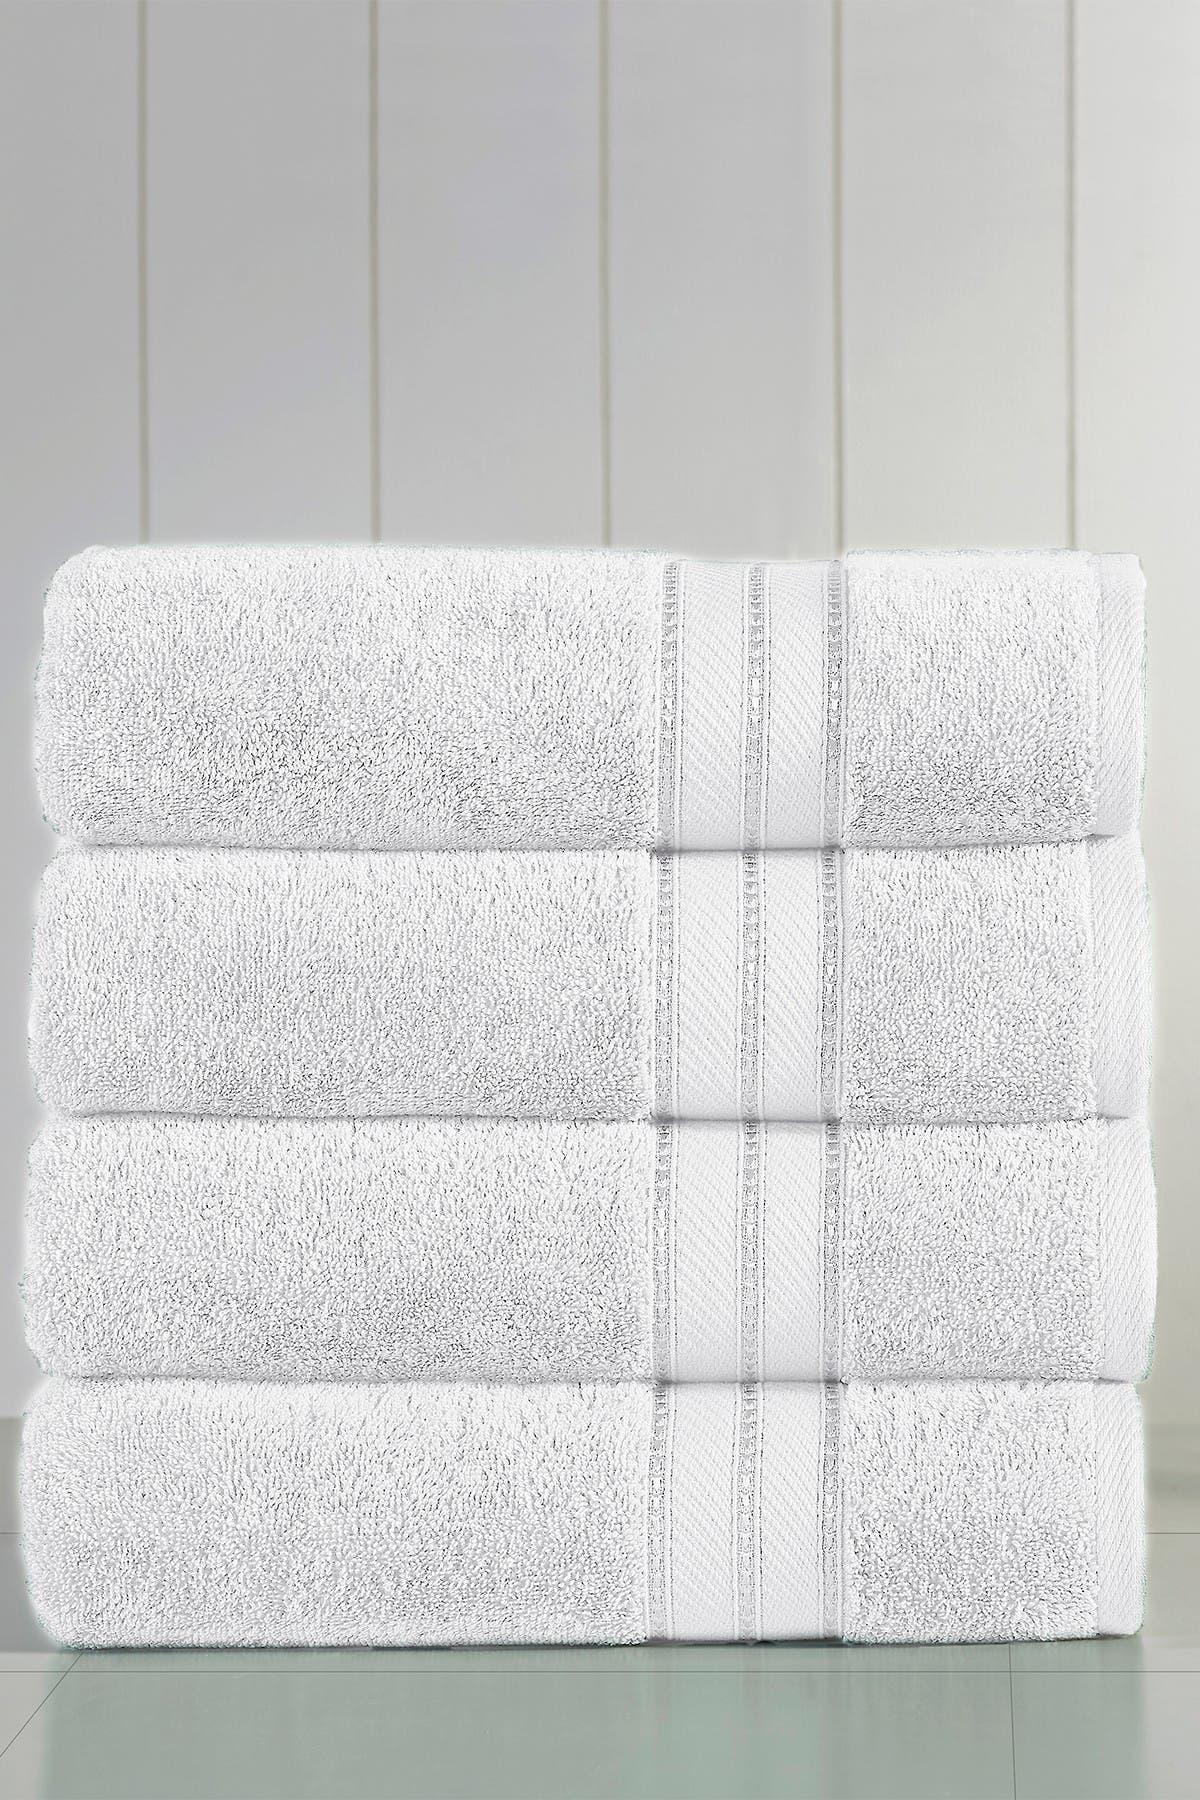 Image of Modern Threads Spunloft Bath Towel - Set of 4 - White